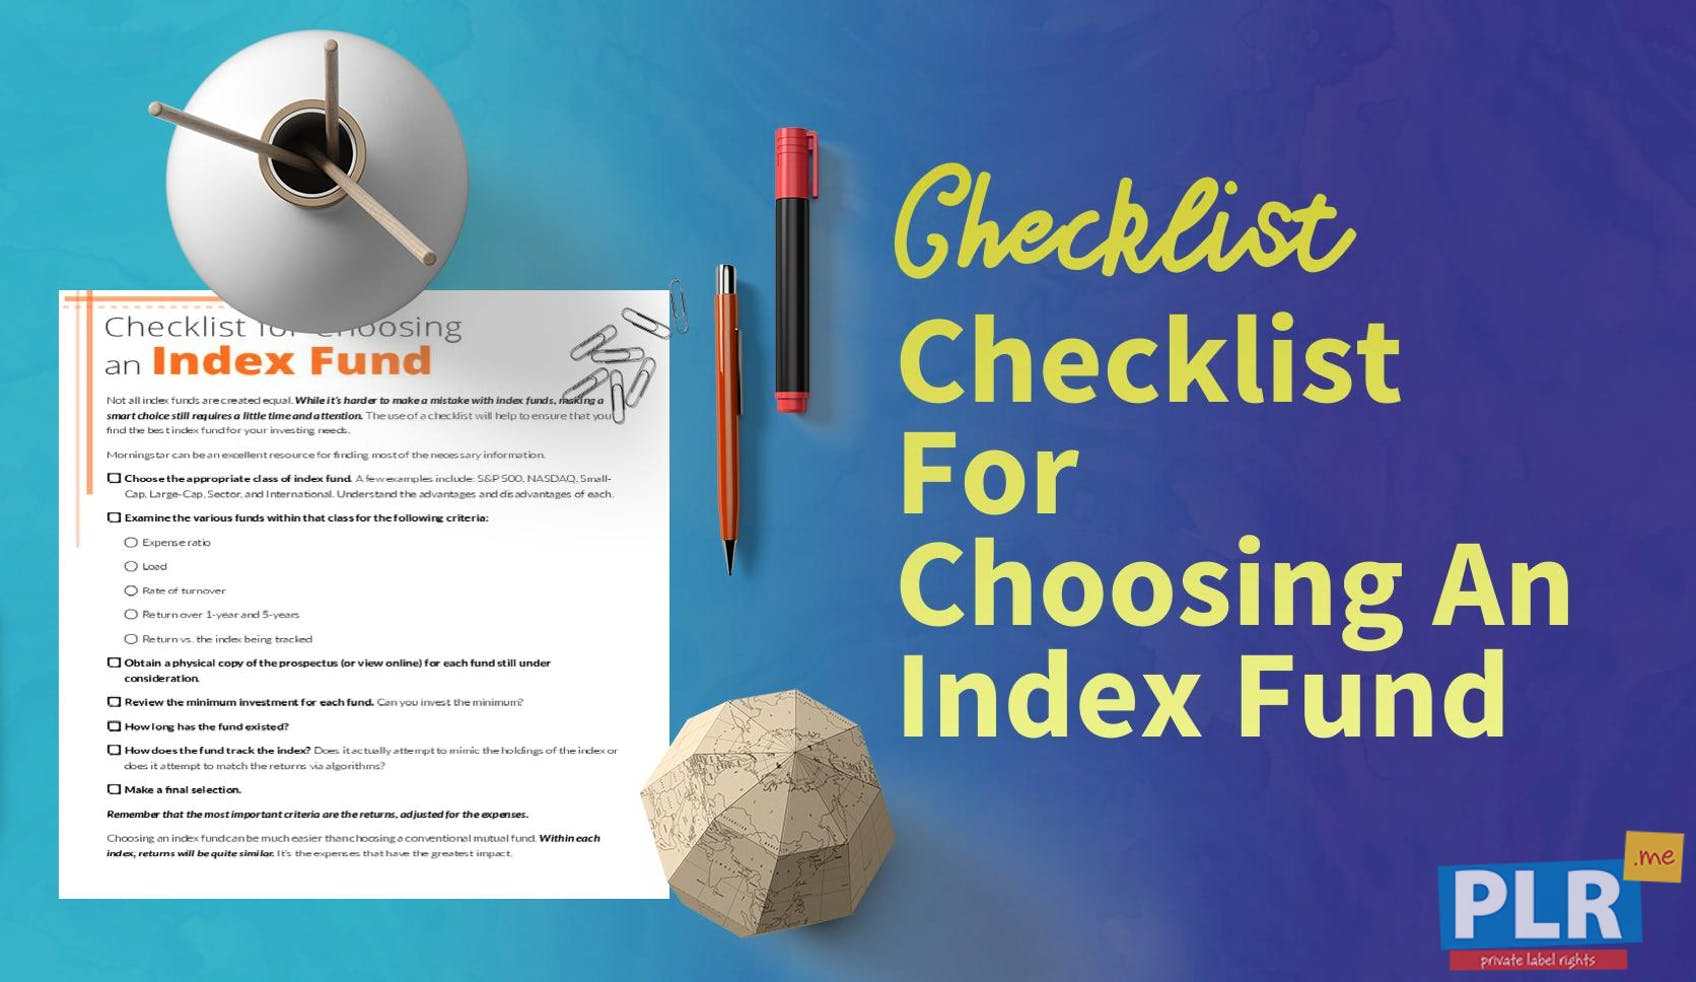 Checklist For Choosing An Index Fund